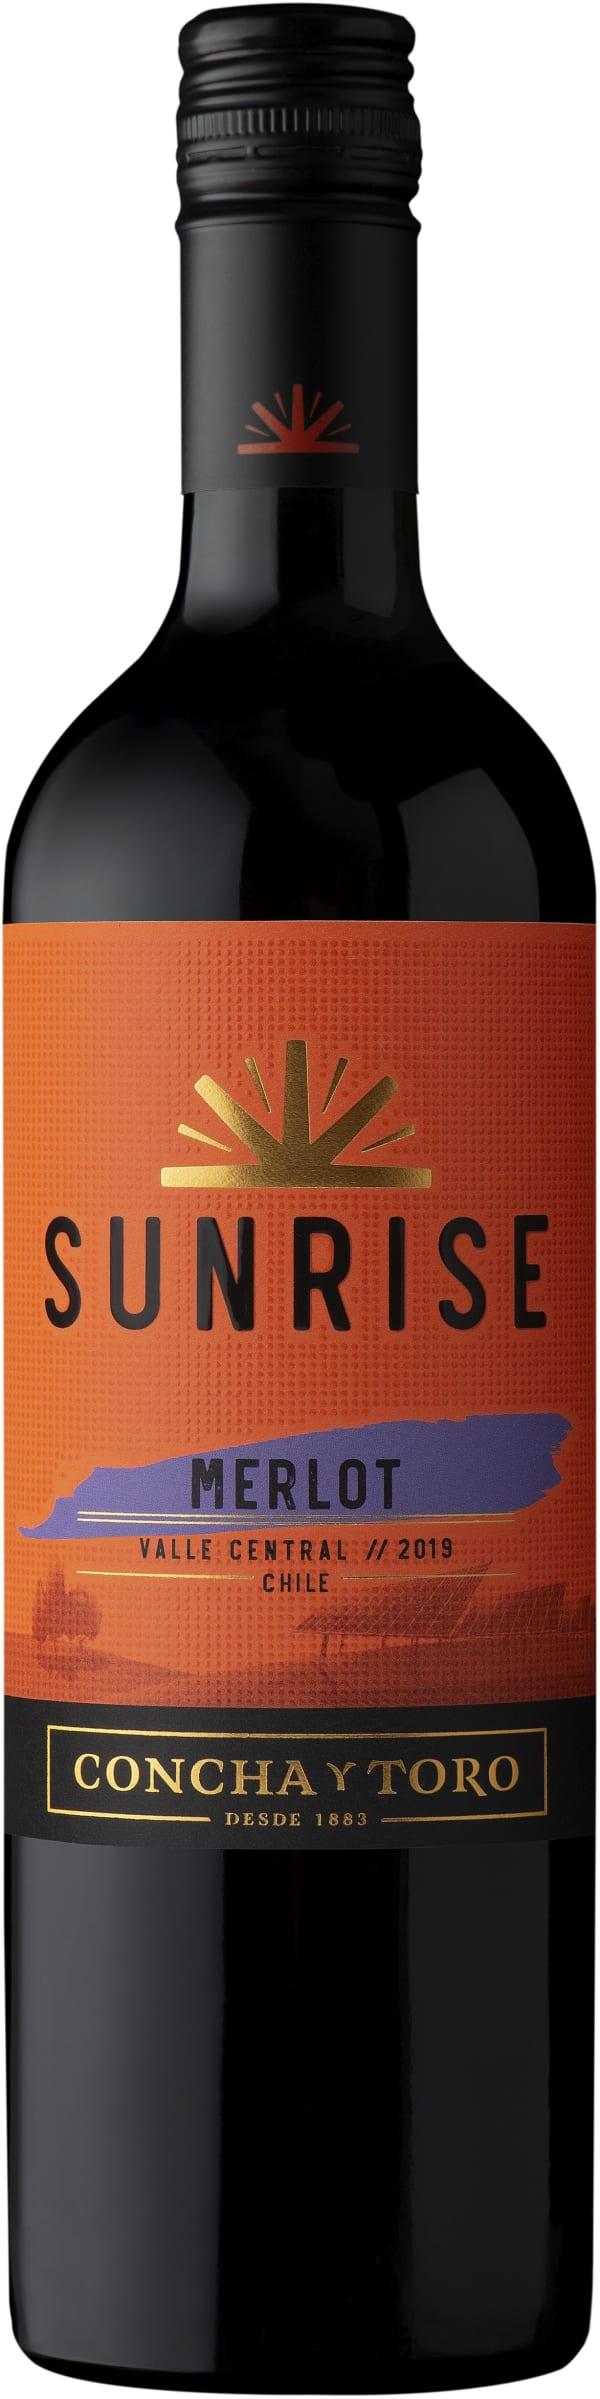 Sunrise Merlot 2017